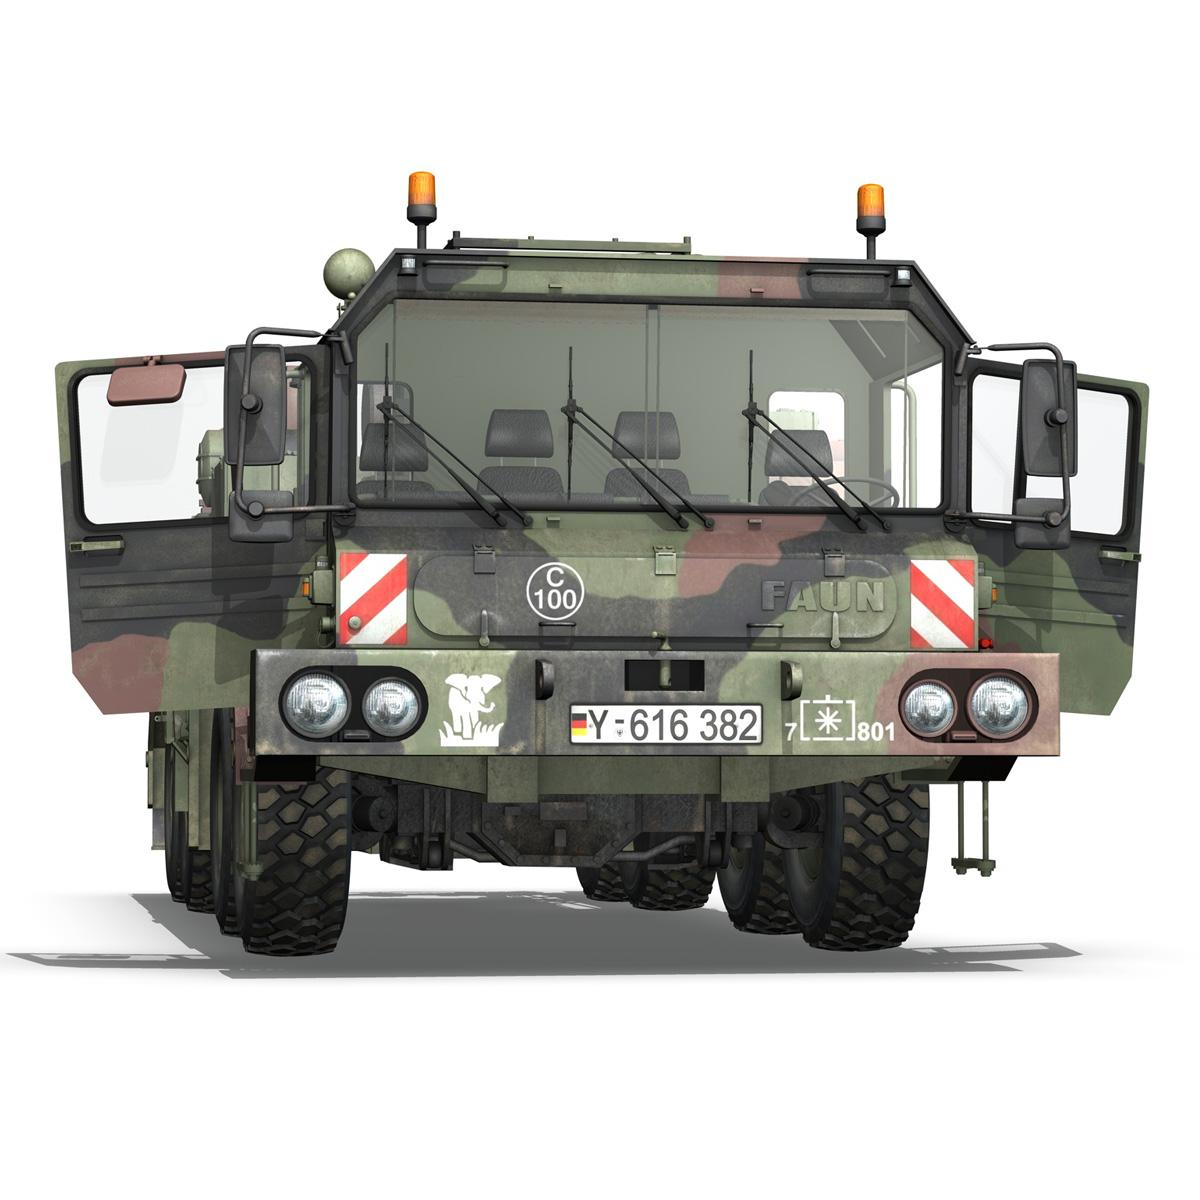 faun stl-56 transportues tank 3d model 3ds fbx c4d lwo obj 201918